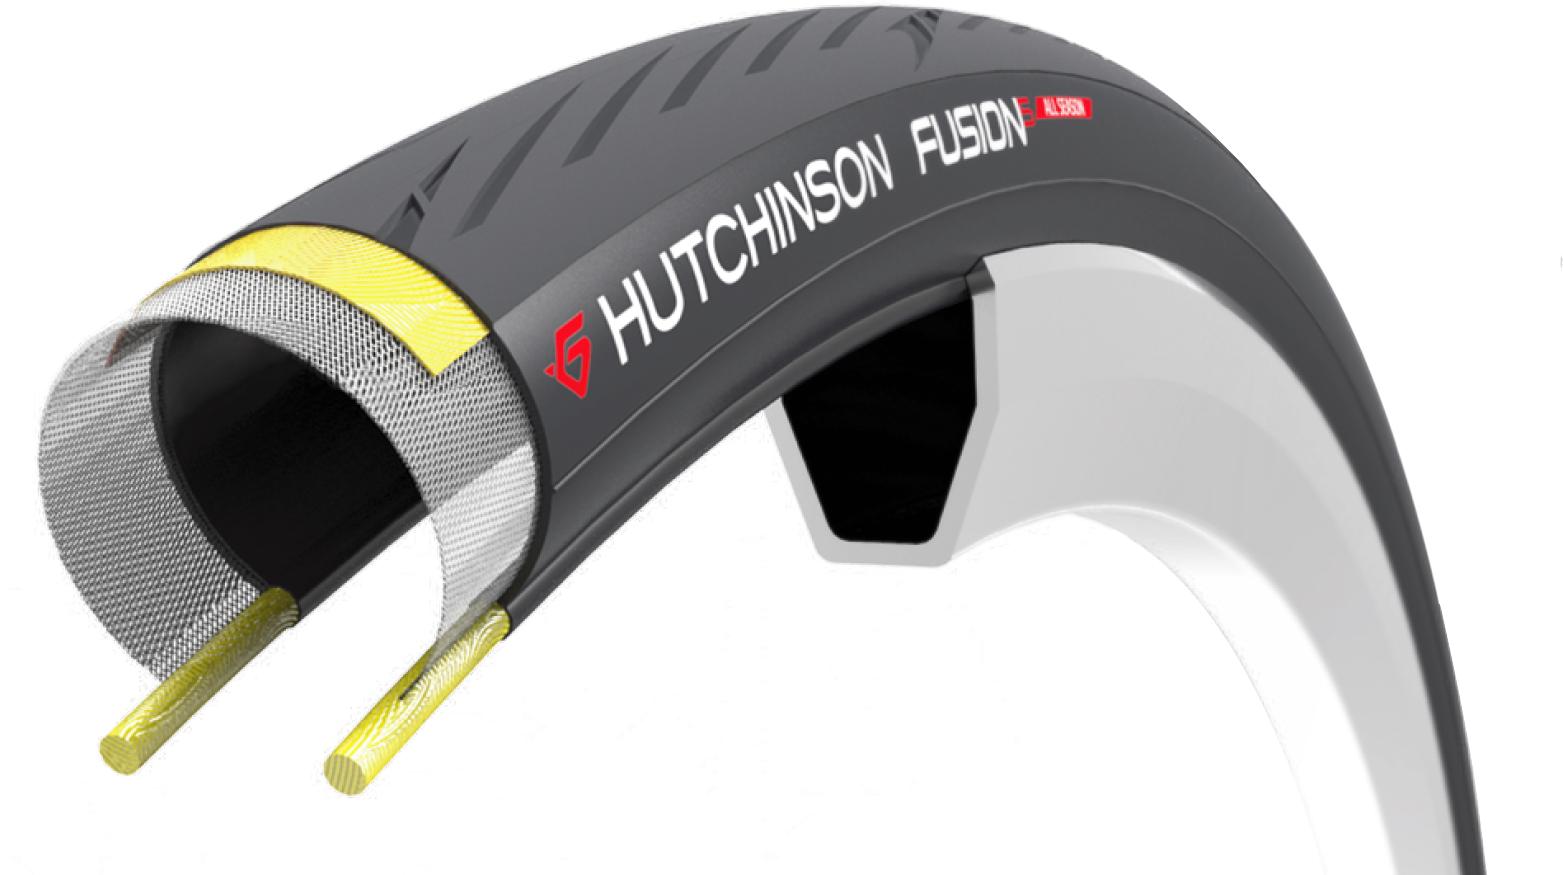 hutchinson fusion 5 all season folding road tyre